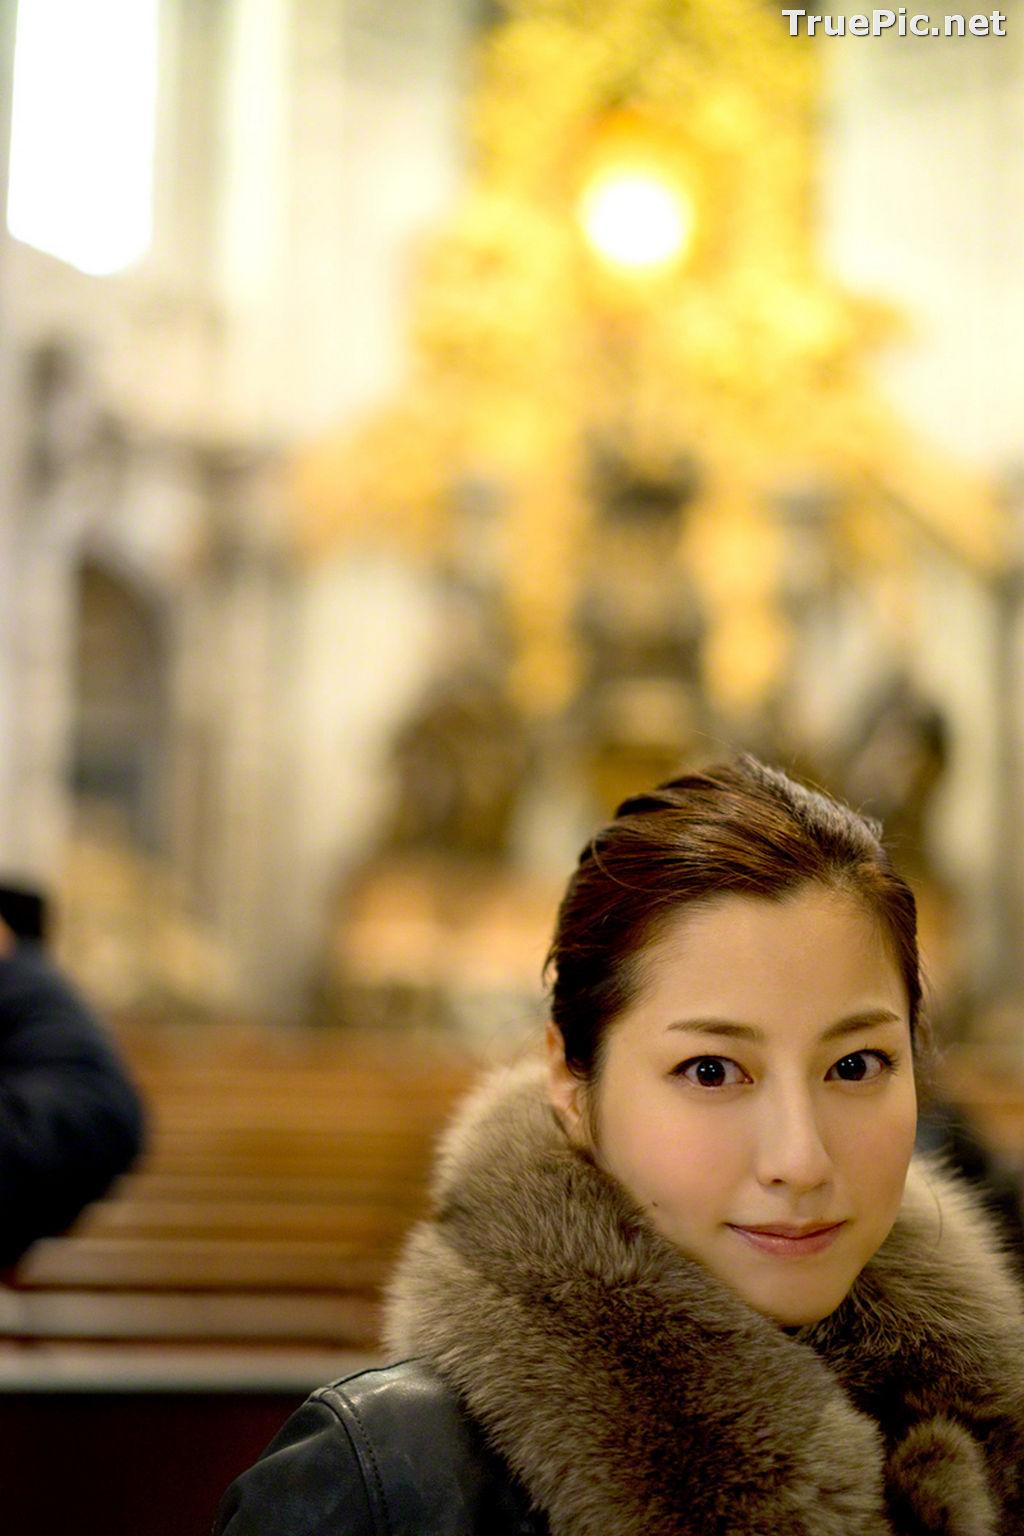 Image Wanibooks No.136 - Japanese Actress and Singer - Yumi Sugimoto - TruePic.net - Picture-1